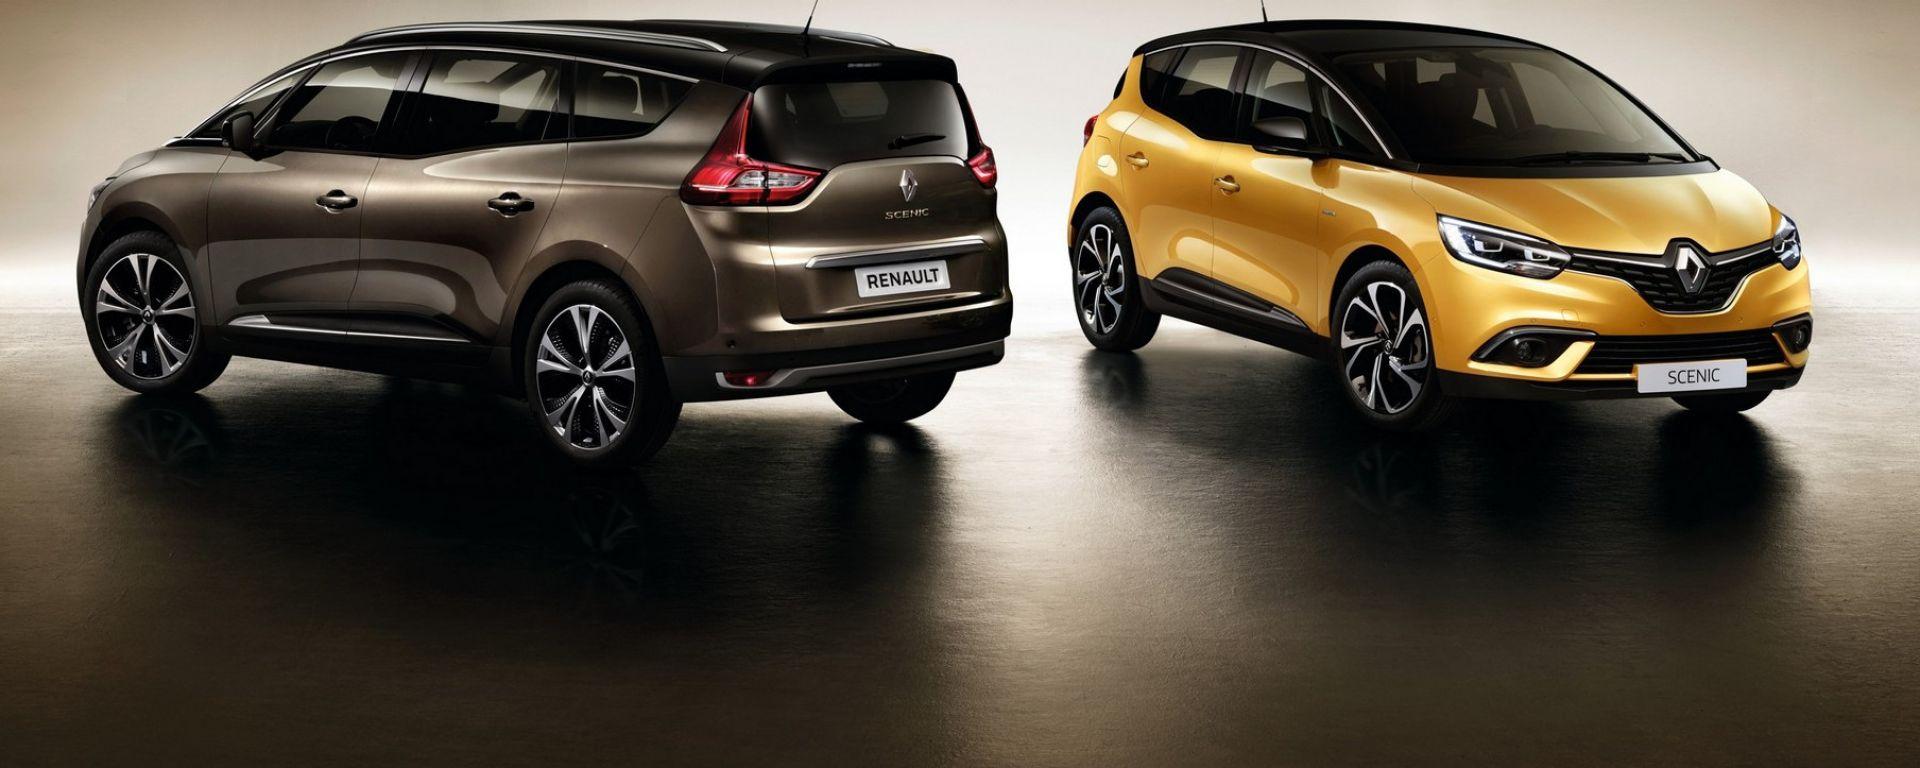 Renault Scénic, anche lei sacrificata dal piano industriale?